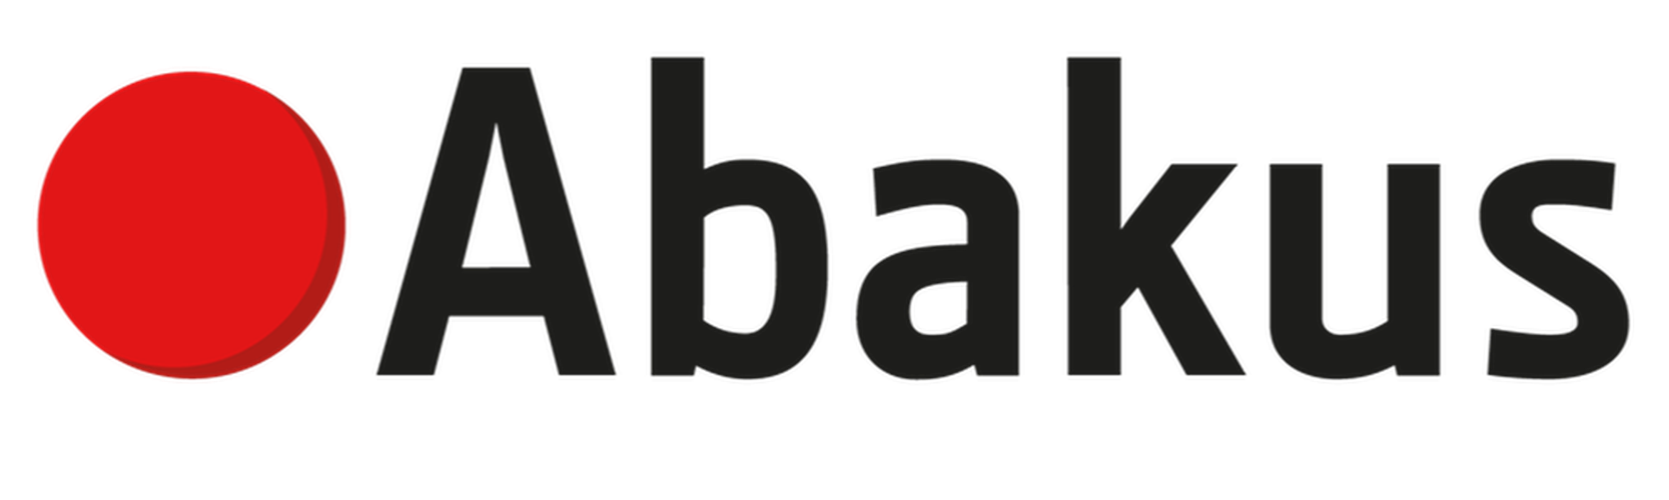 Utvalget - Abakus2021 page banner